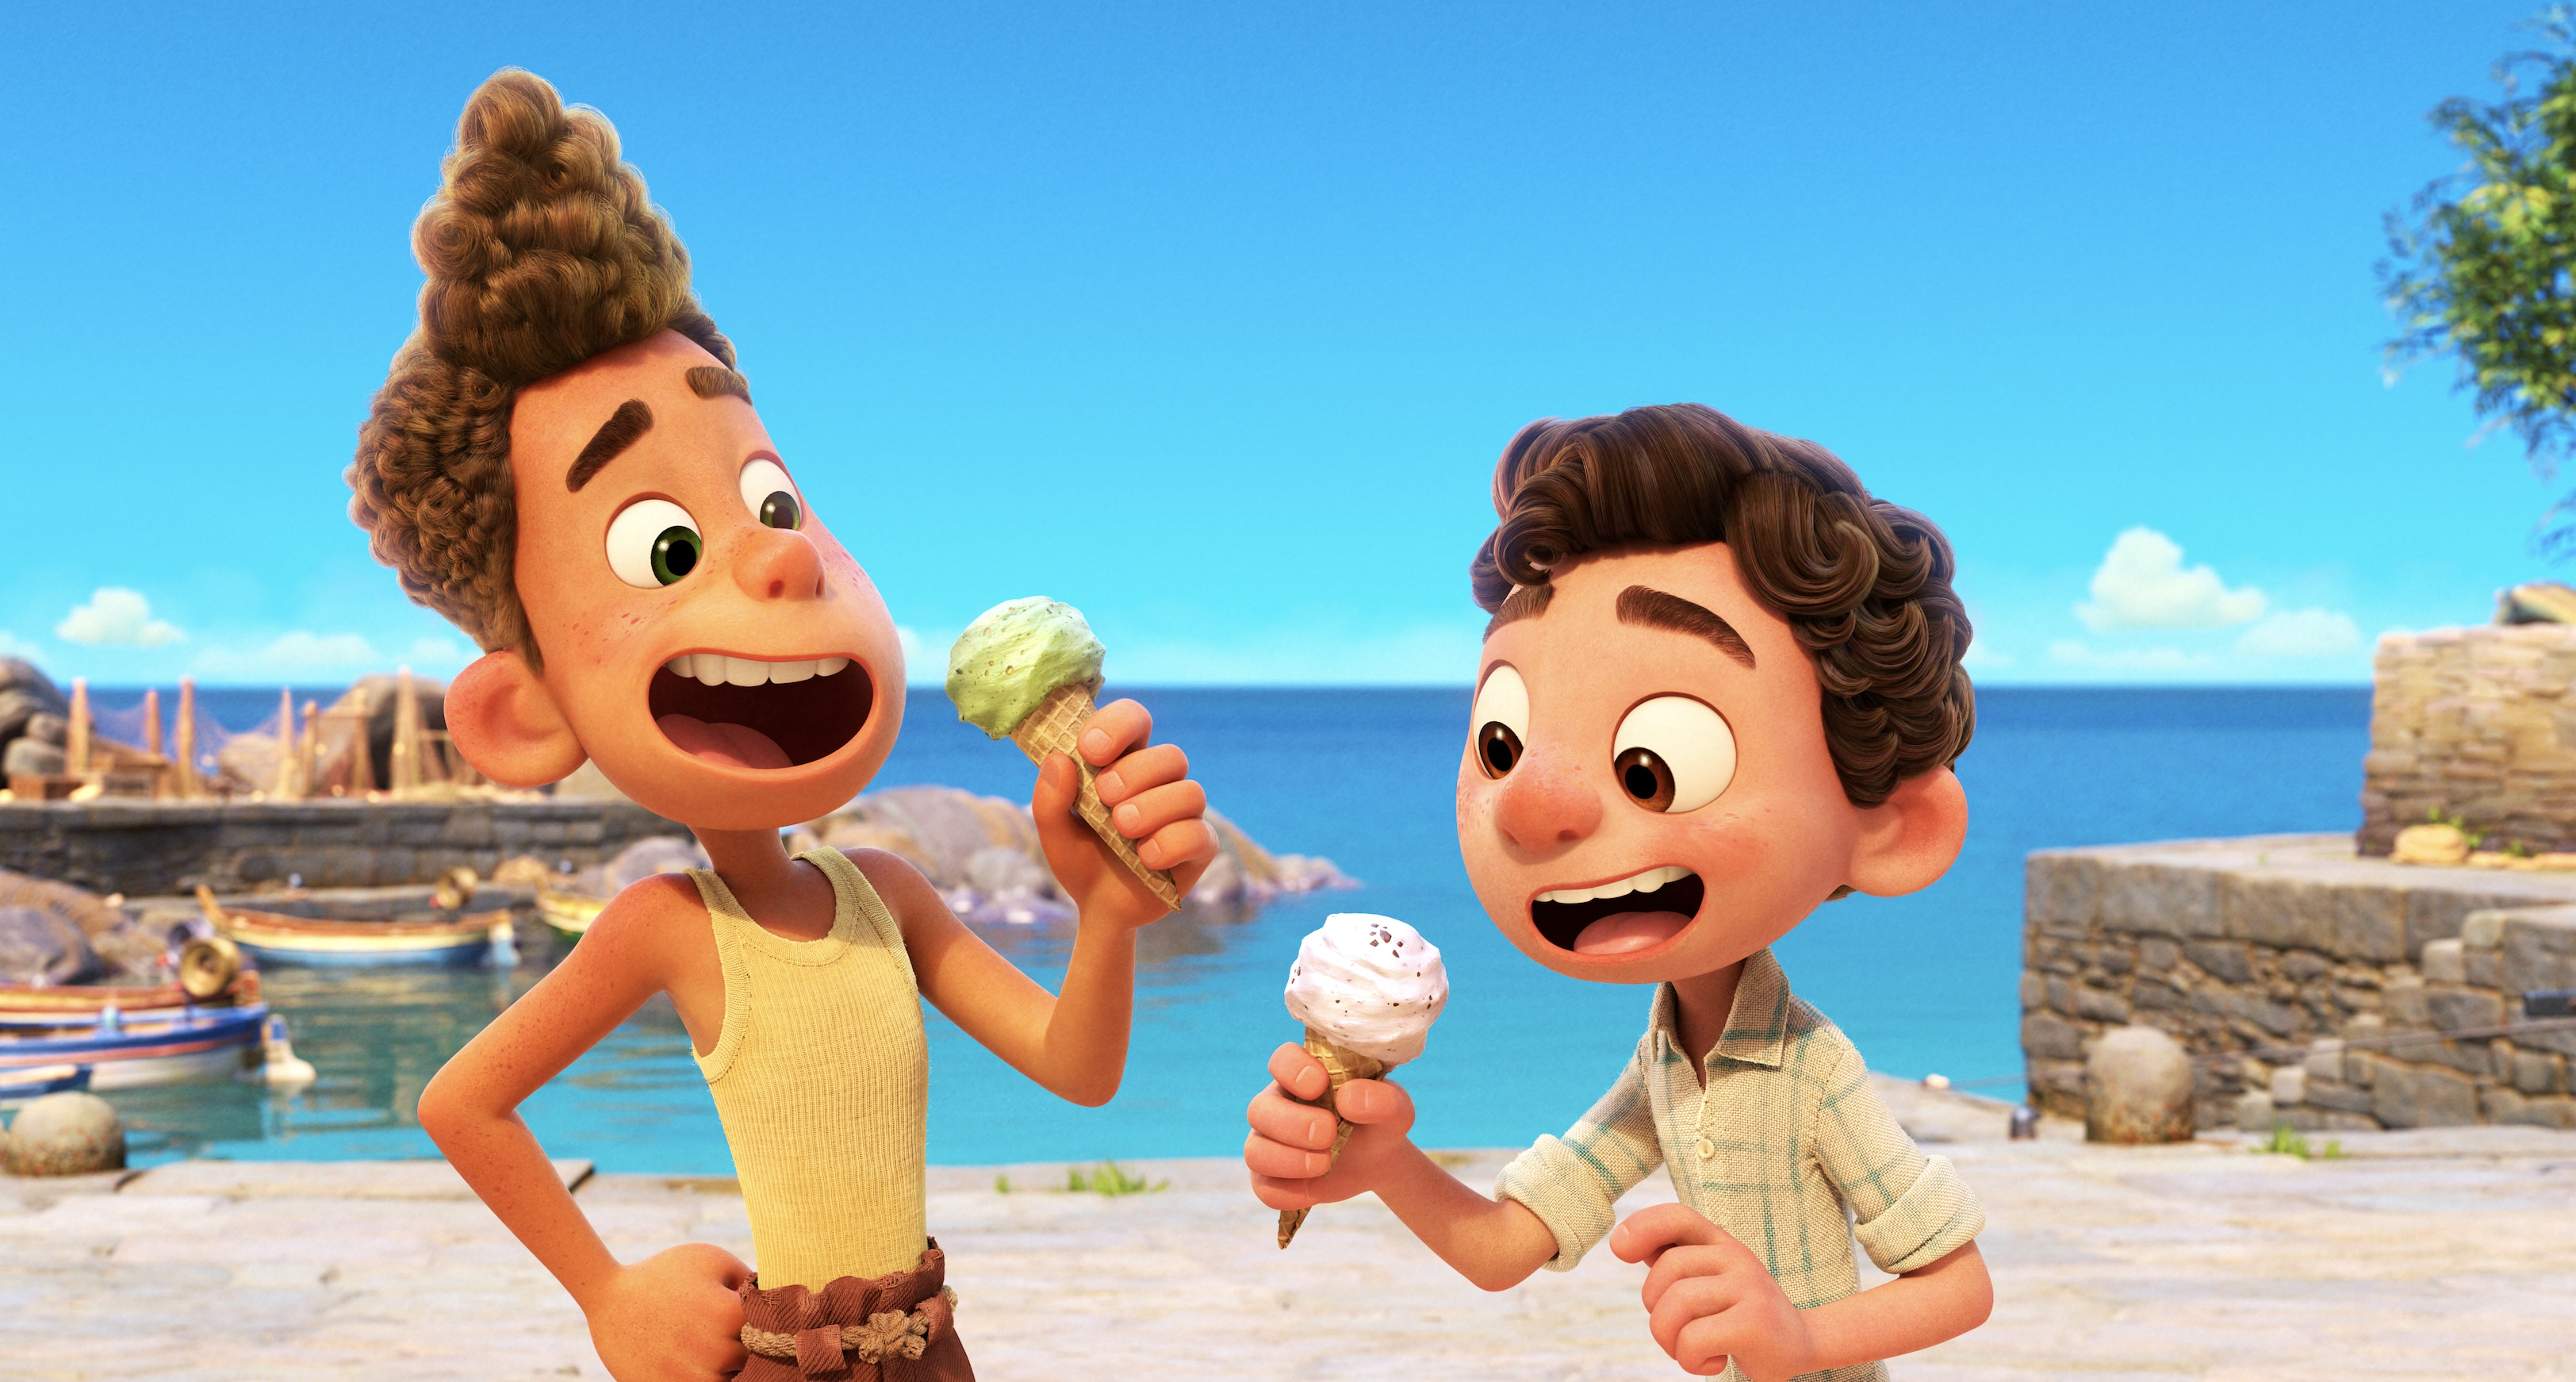 Luca and Alberto eat gelato